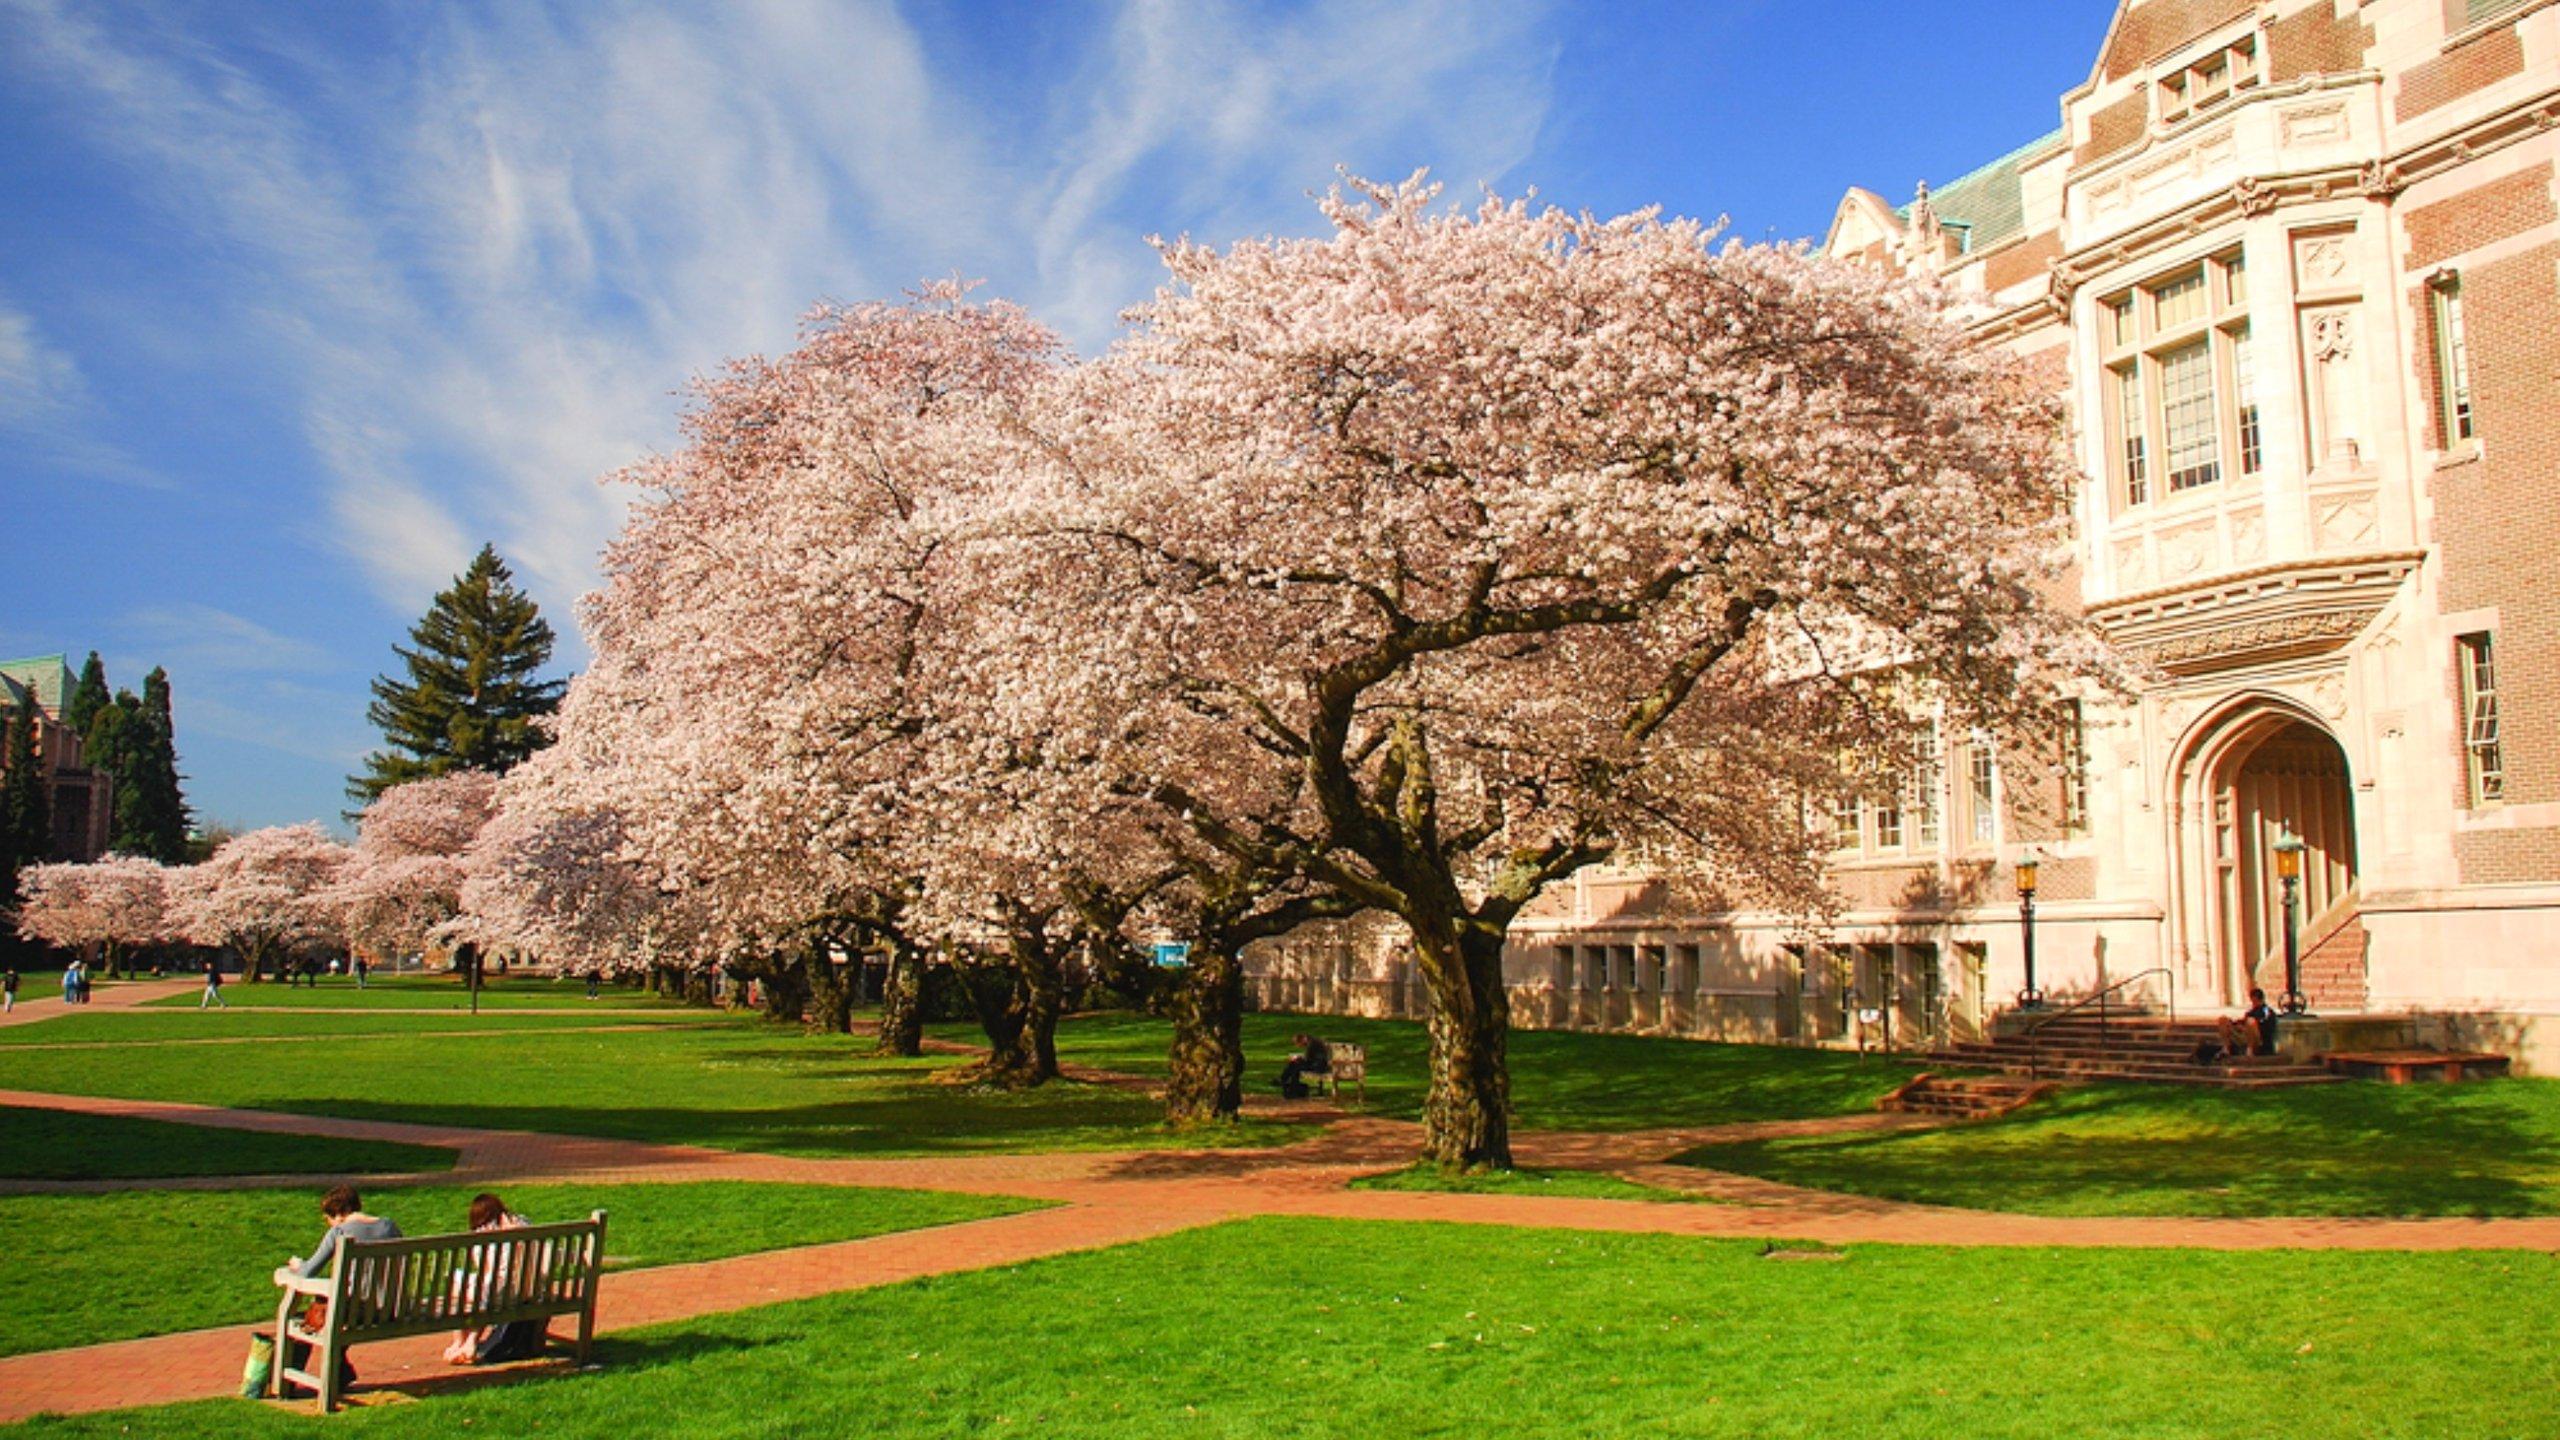 Northeast Seattle, Washington, United States of America